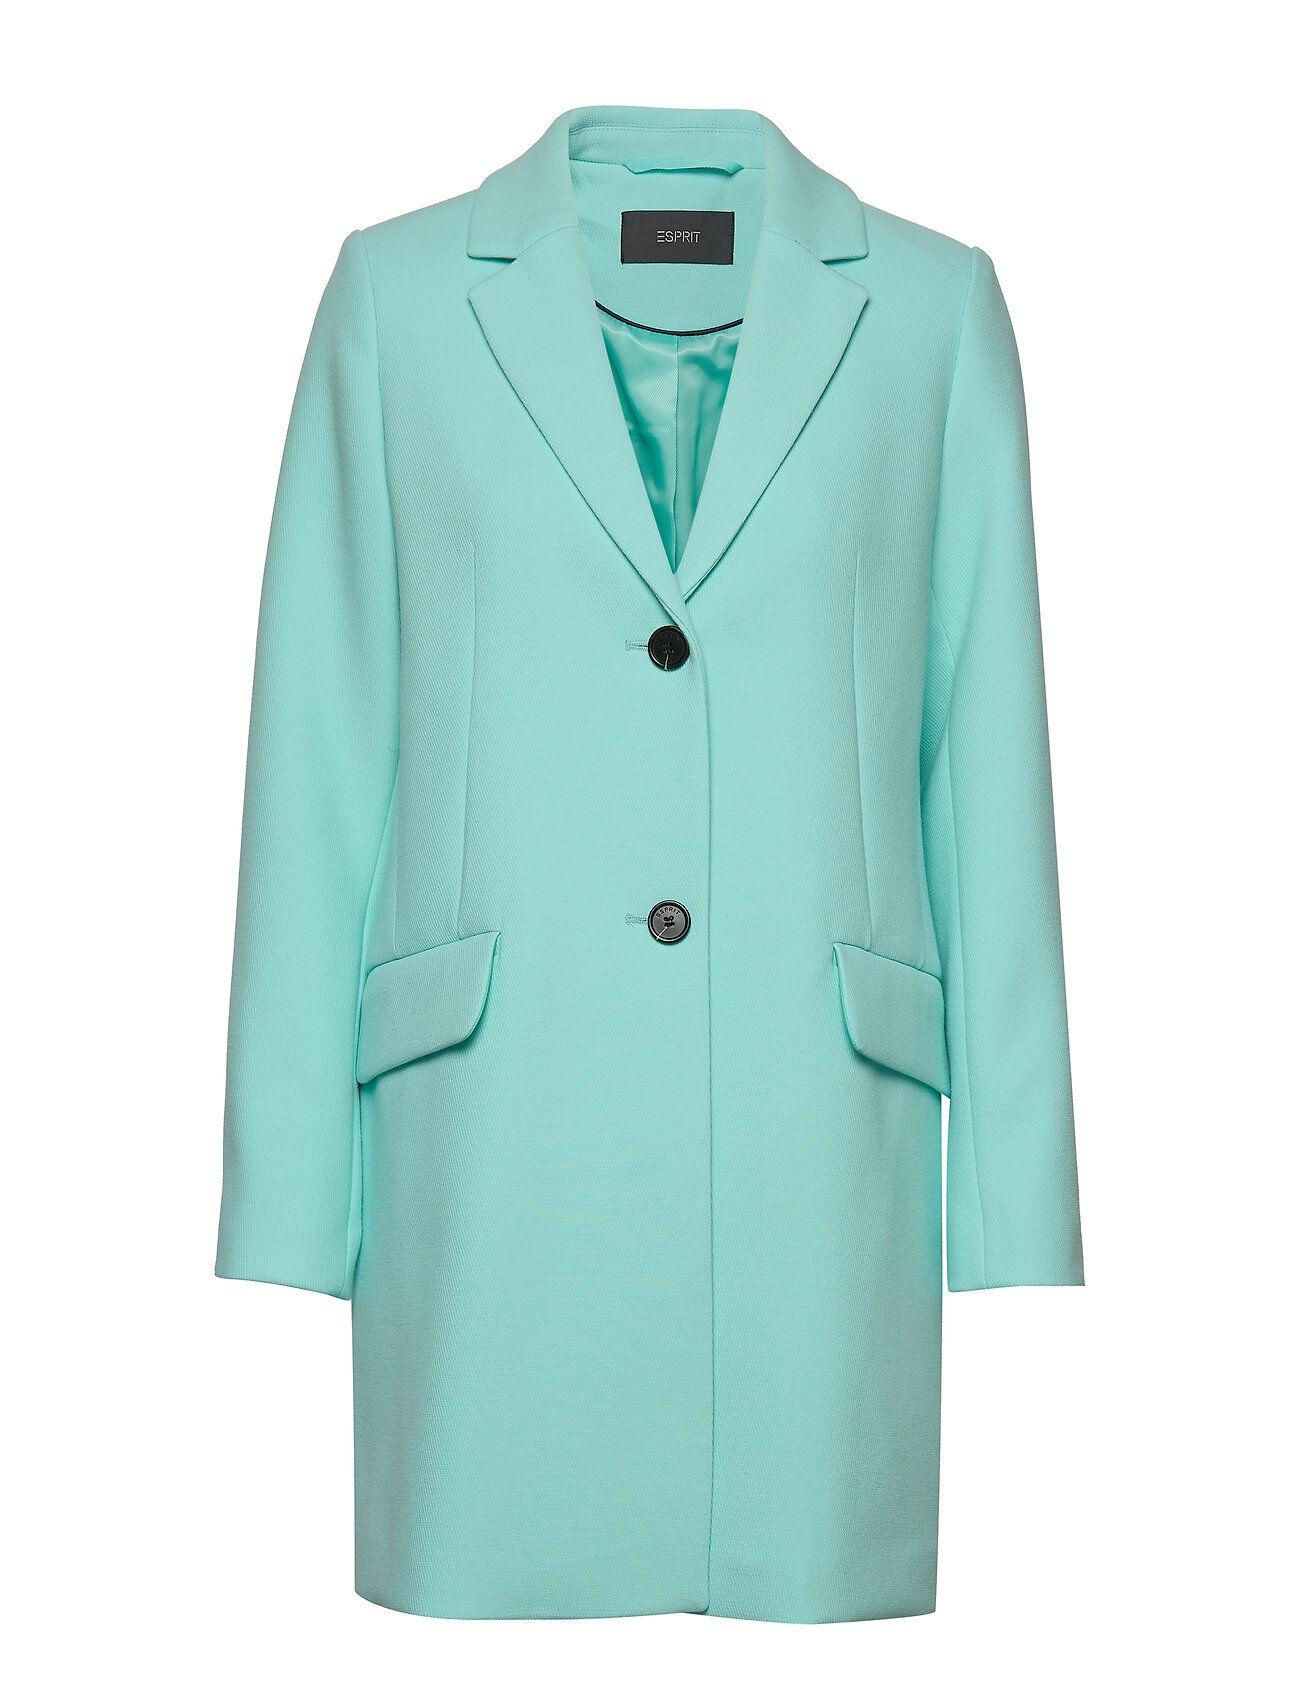 Image of Esprit Collection Coats Woven Bleiseri Puvun Takki Sininen Esprit Collection